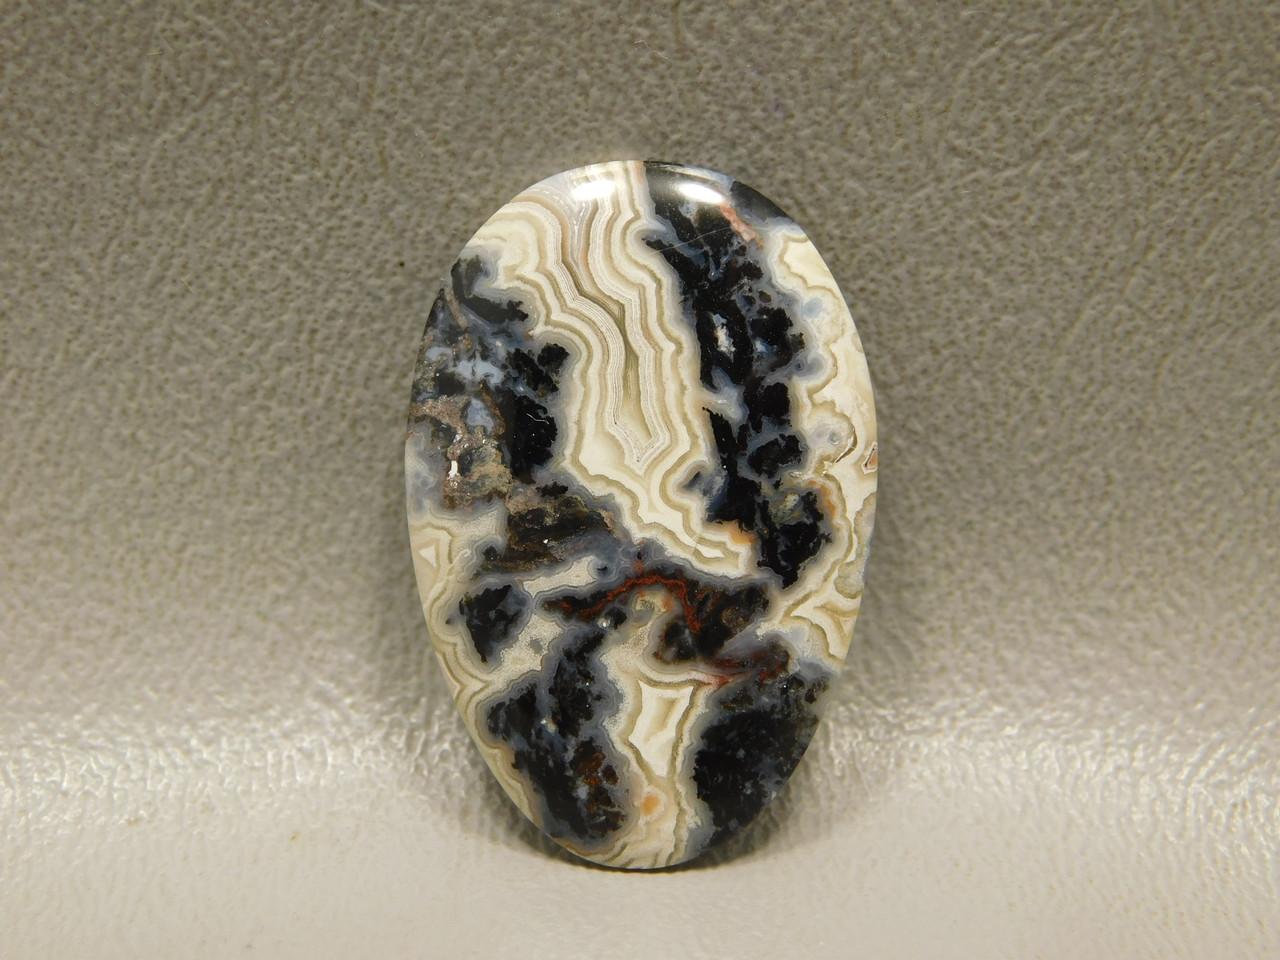 Crazy Lace Agate Cabochon Stone Elliptical or Egg Shaped #12